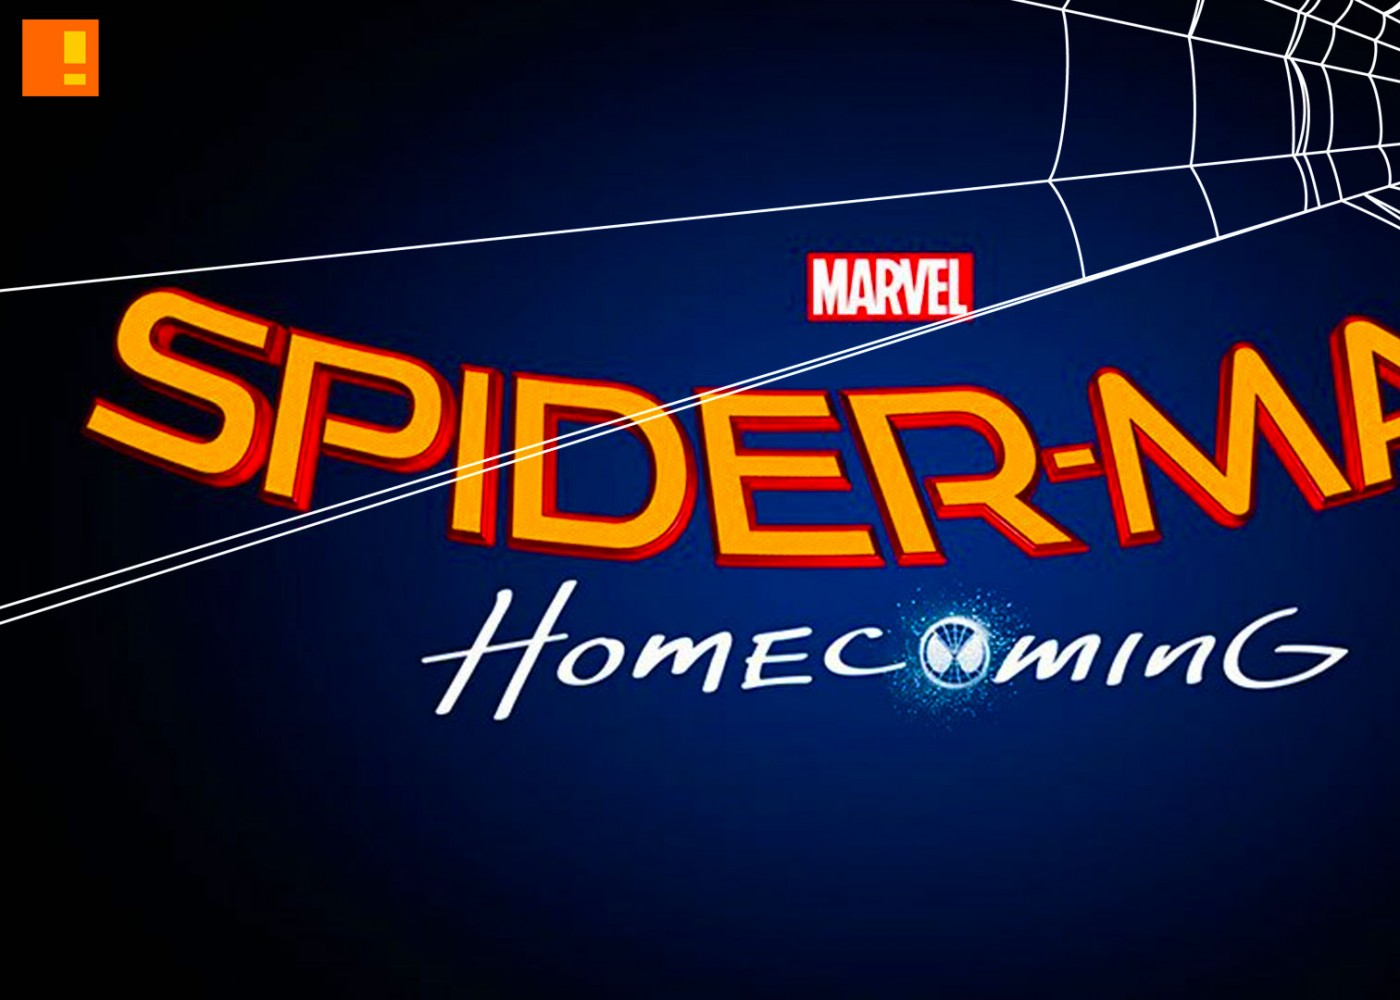 spider-man, Homecoming, marvel, the action pixel, tom holland, peter parker, sony, marvel, tony stark , robert downey jr., iron man